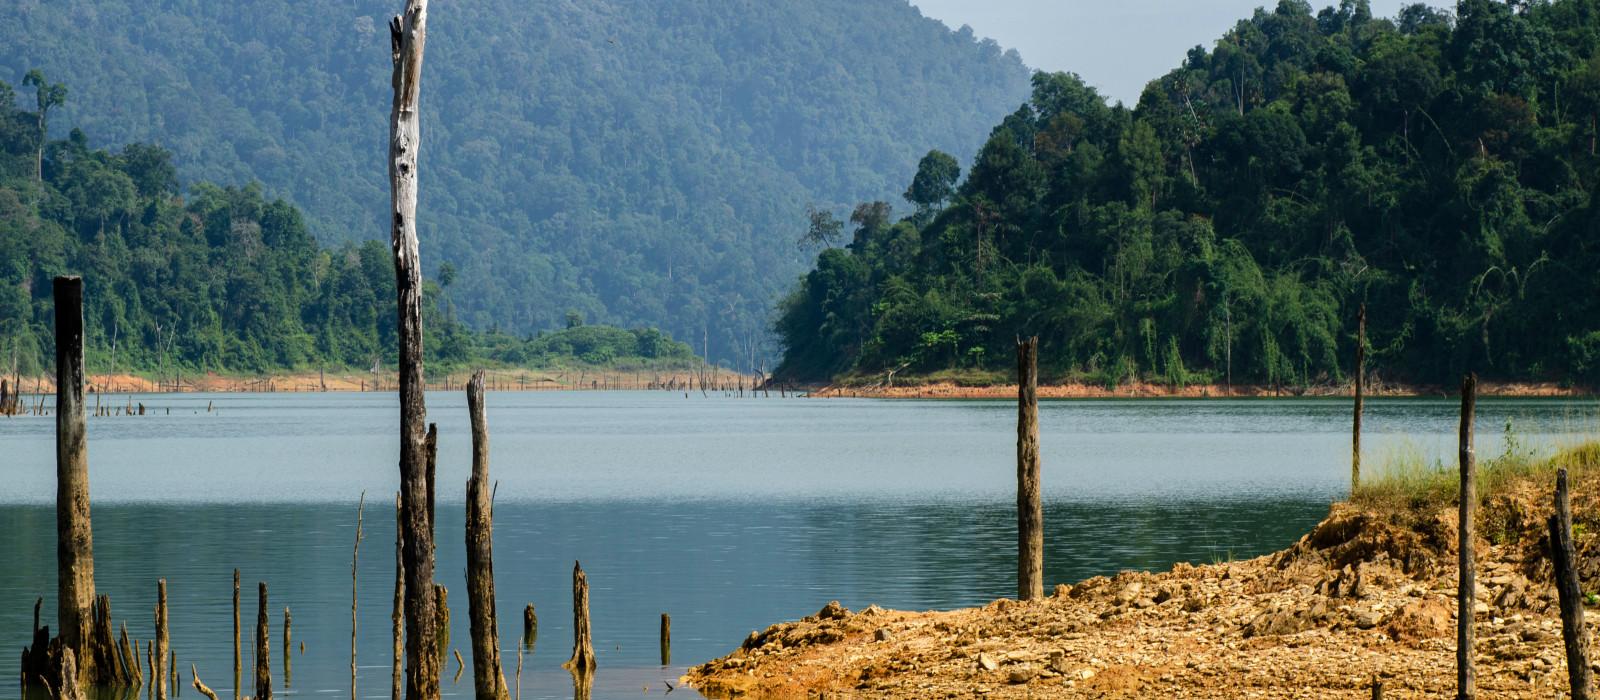 Reiseziel Royal Belum State Park Malaysia